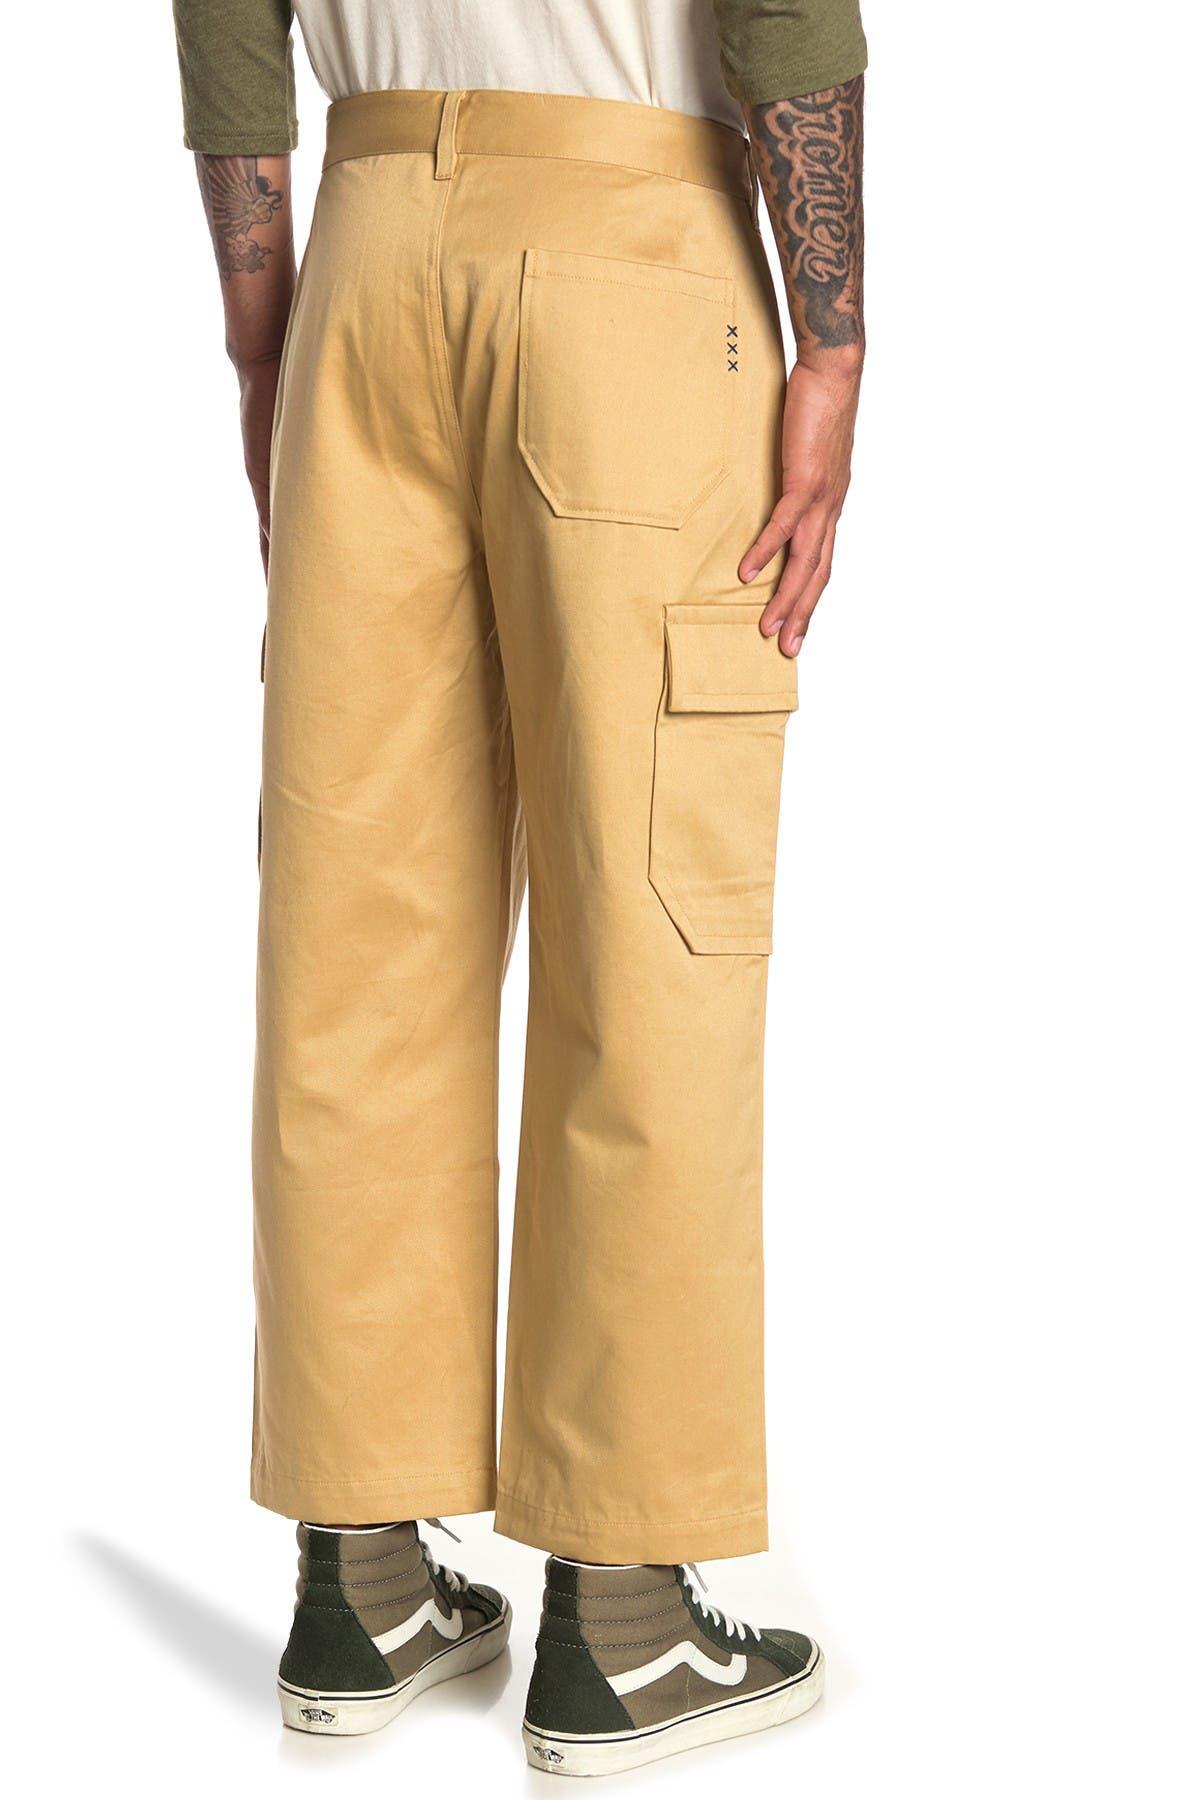 Image of Scotch & Soda Workwear Cargo Pants